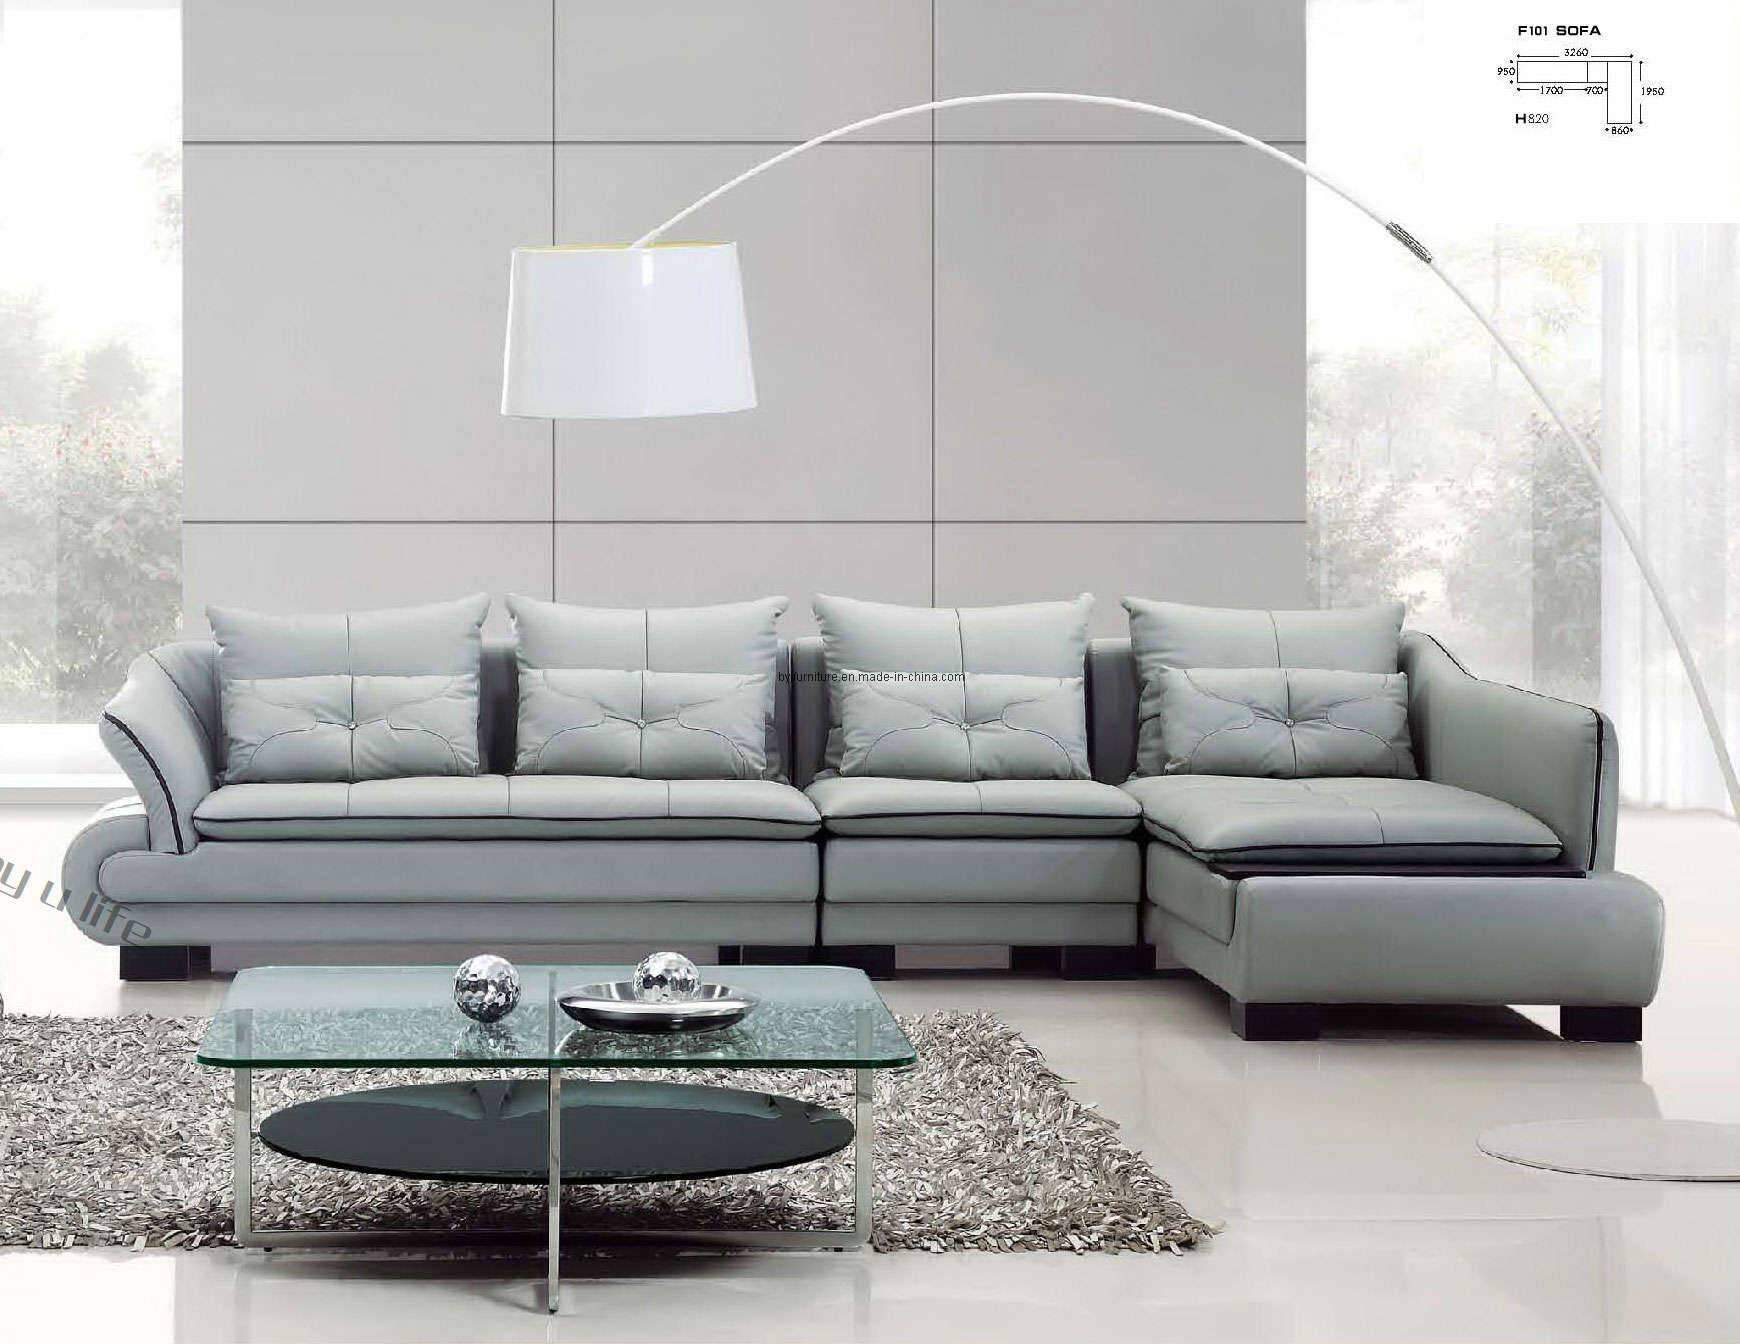 25 Latest Sofa Set Designs For Living Room Furniture Ideas - Hgnv inside Modern Sofas (Image 1 of 15)